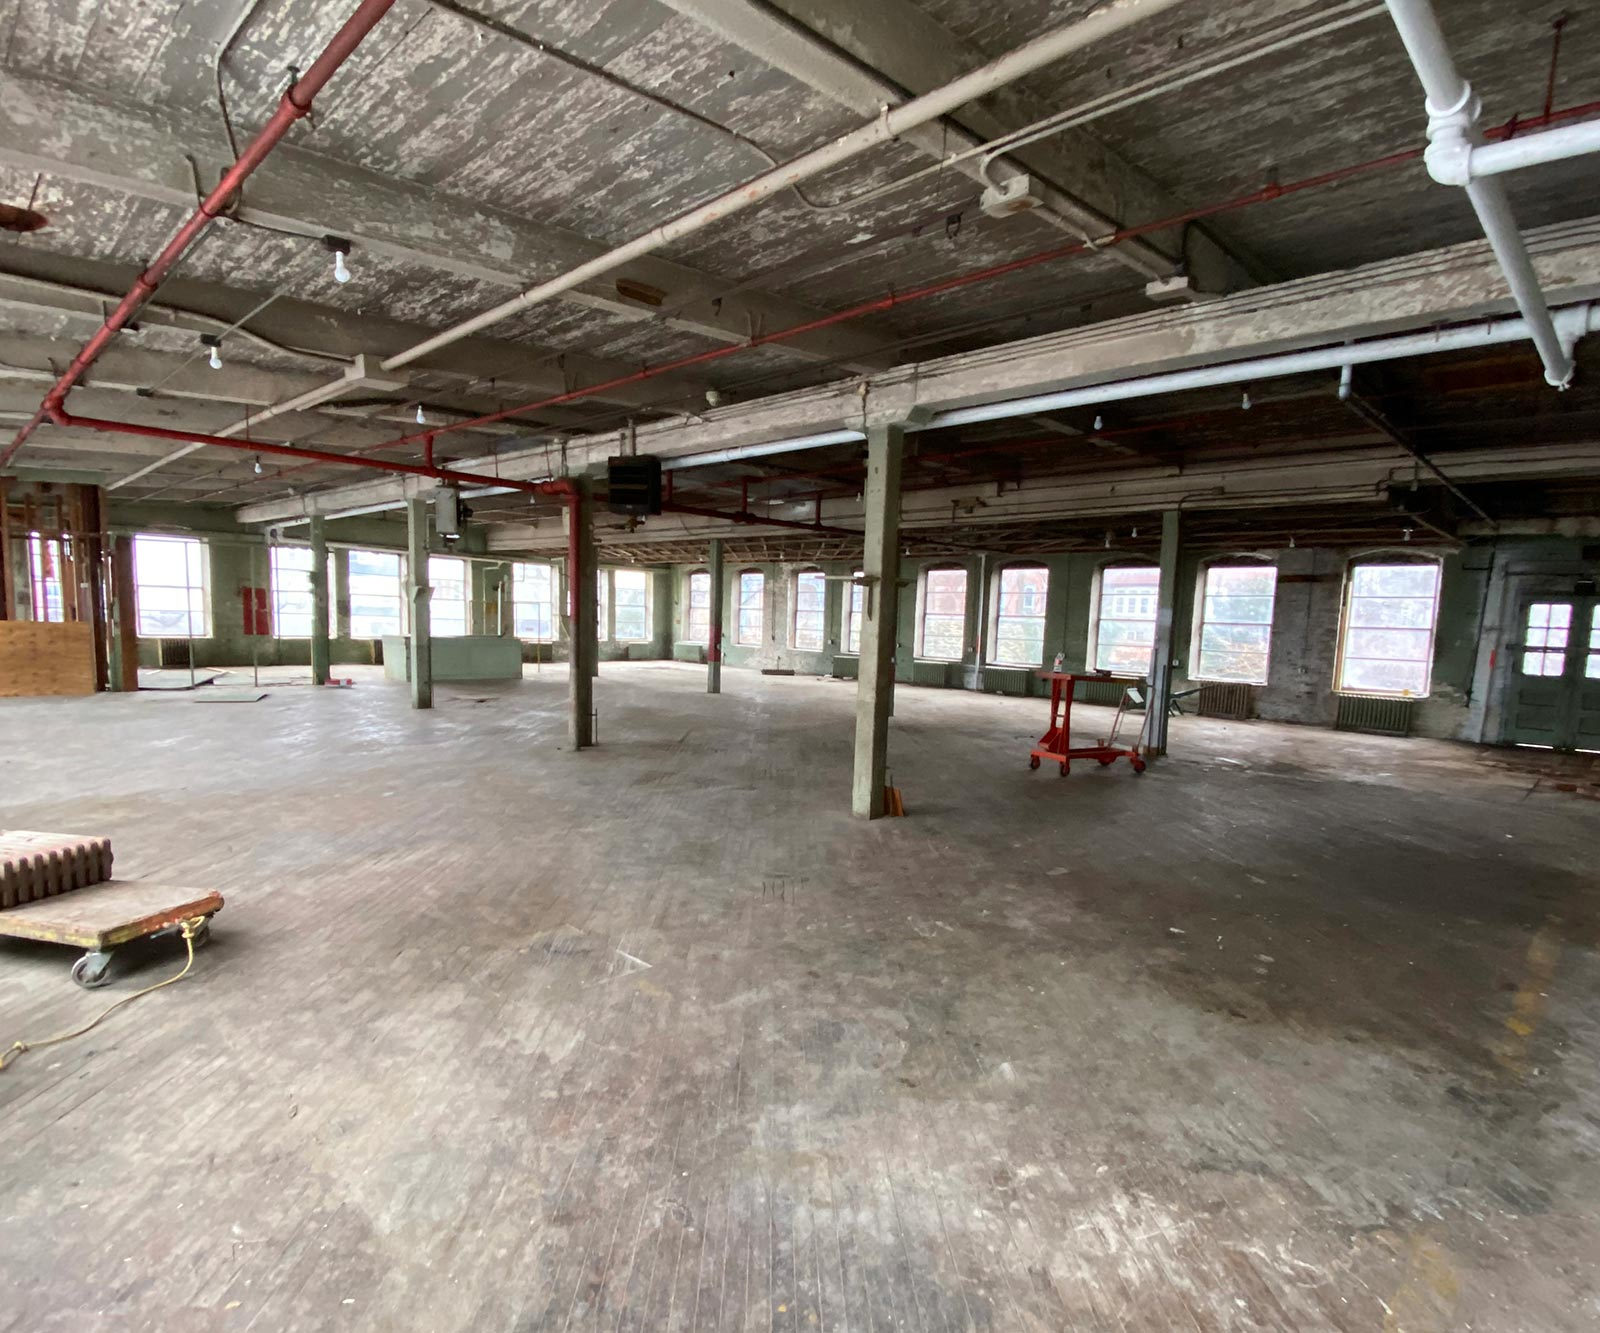 Hatched Spaces - Under Construction